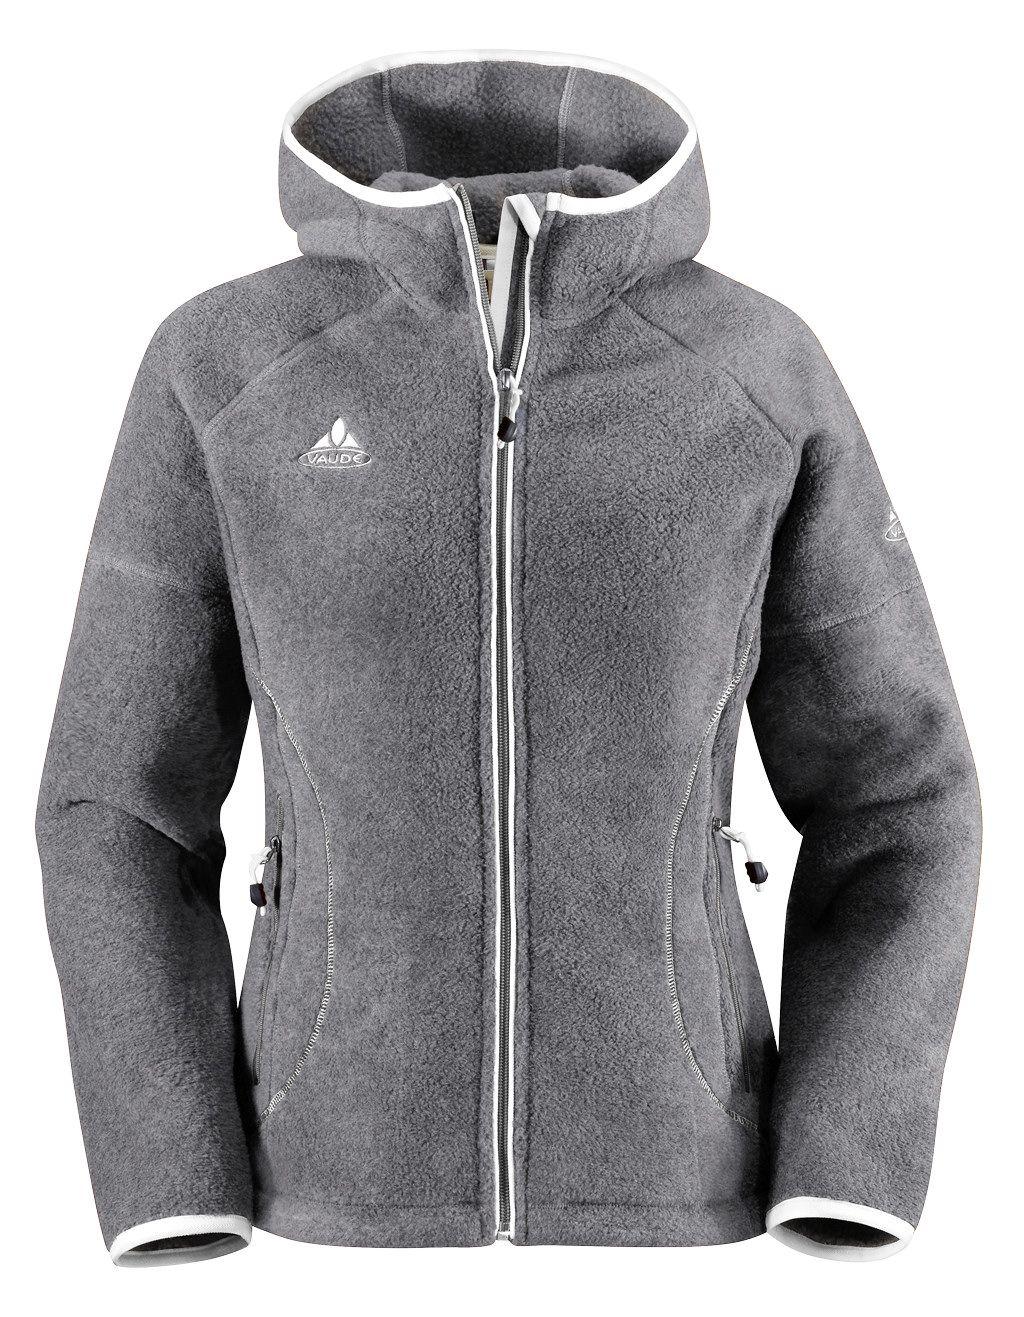 Vaude damen jacke valluga fleece jacket ii